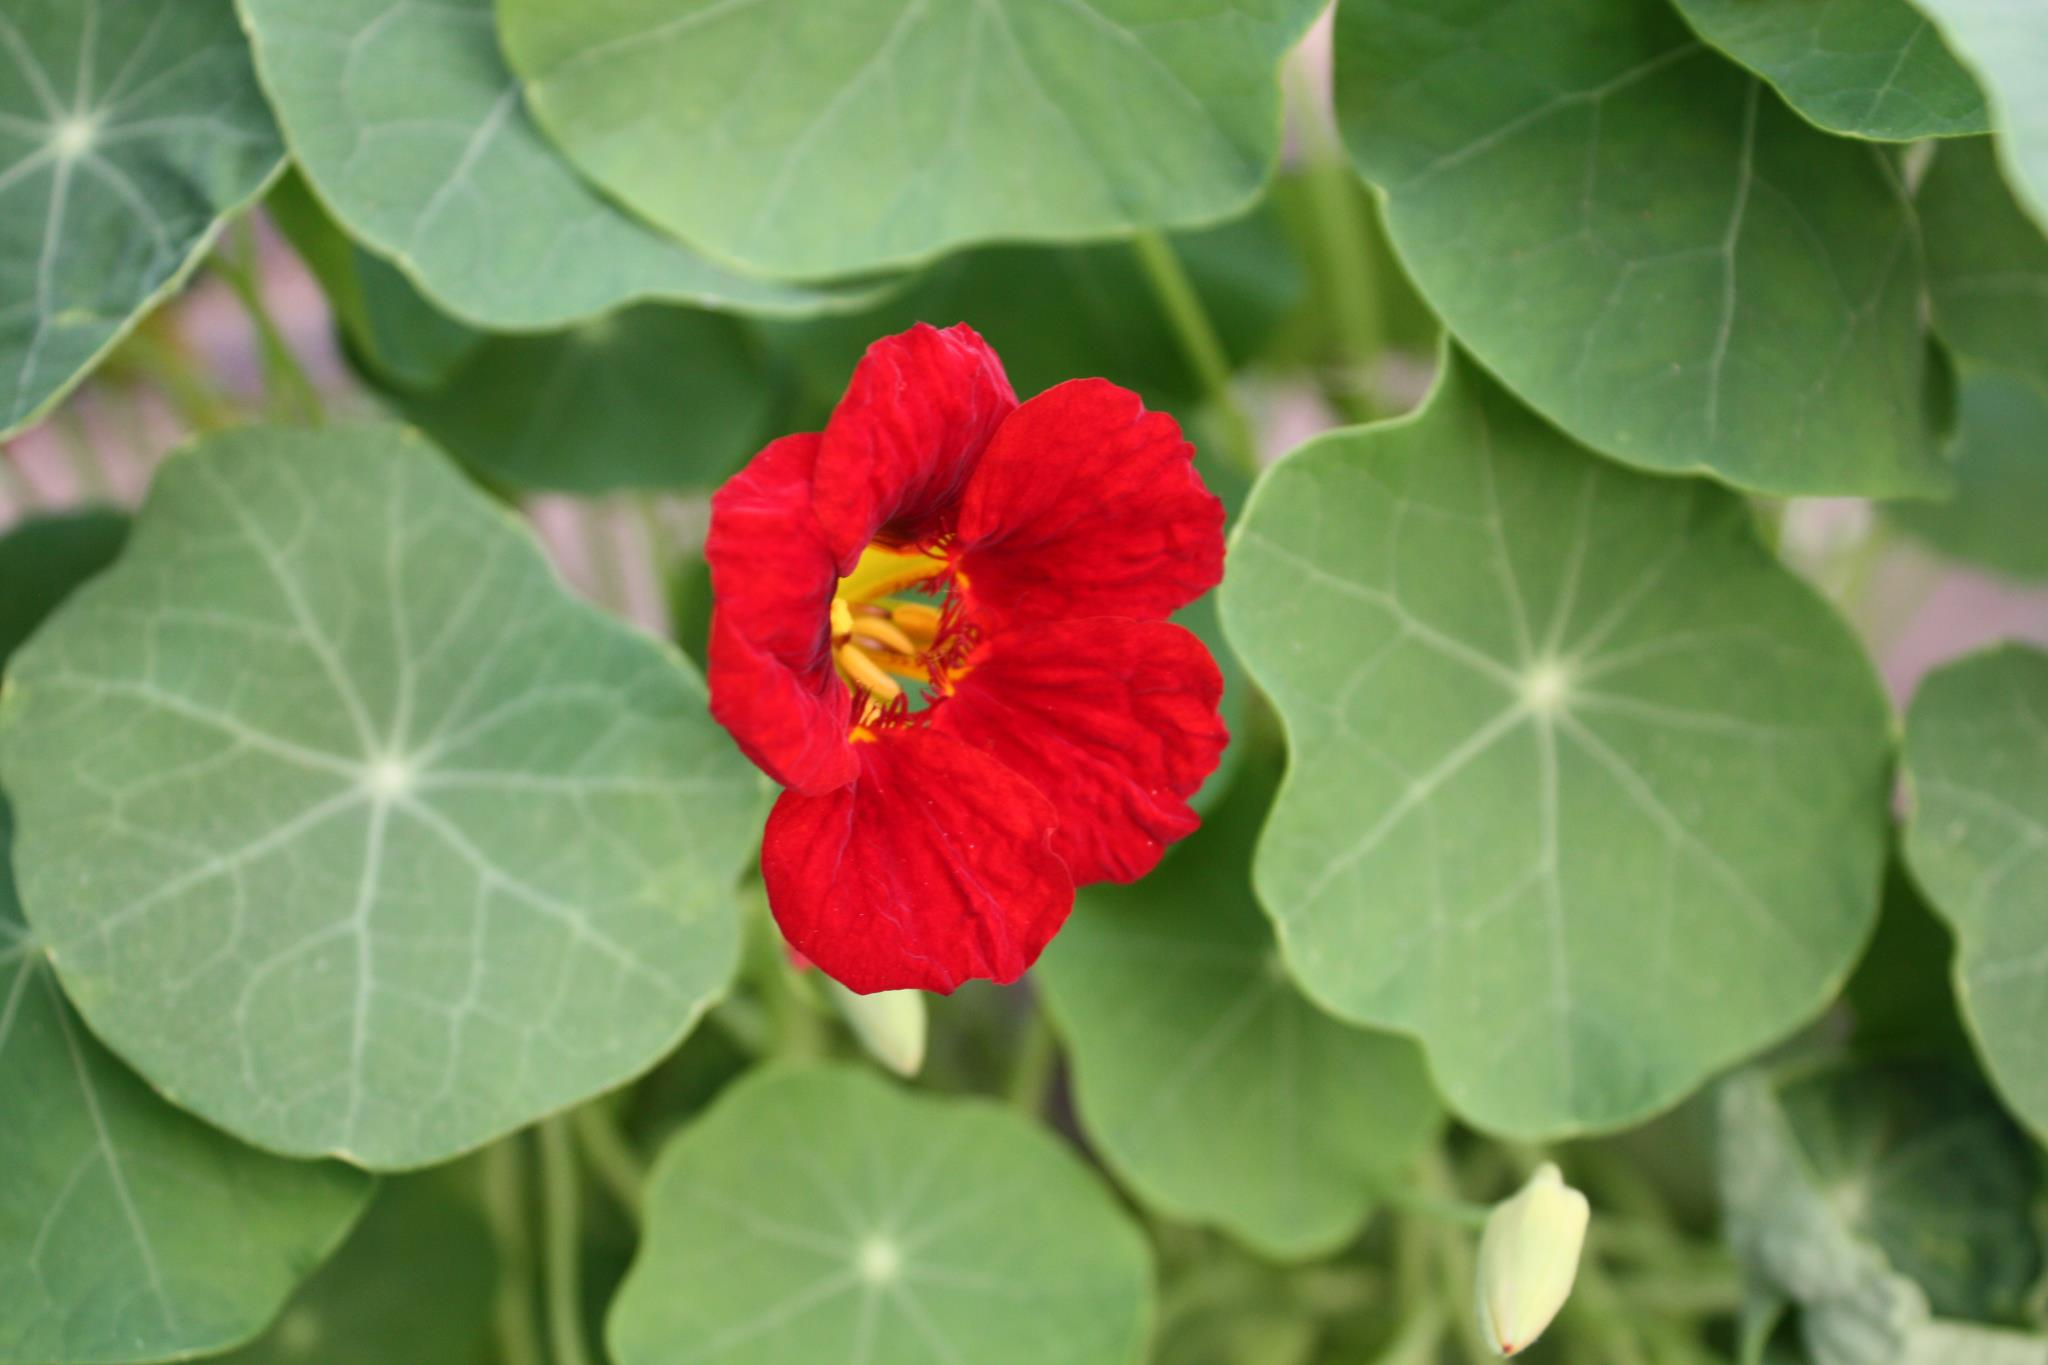 Edible flowers - Greenspot Organics Namibia.